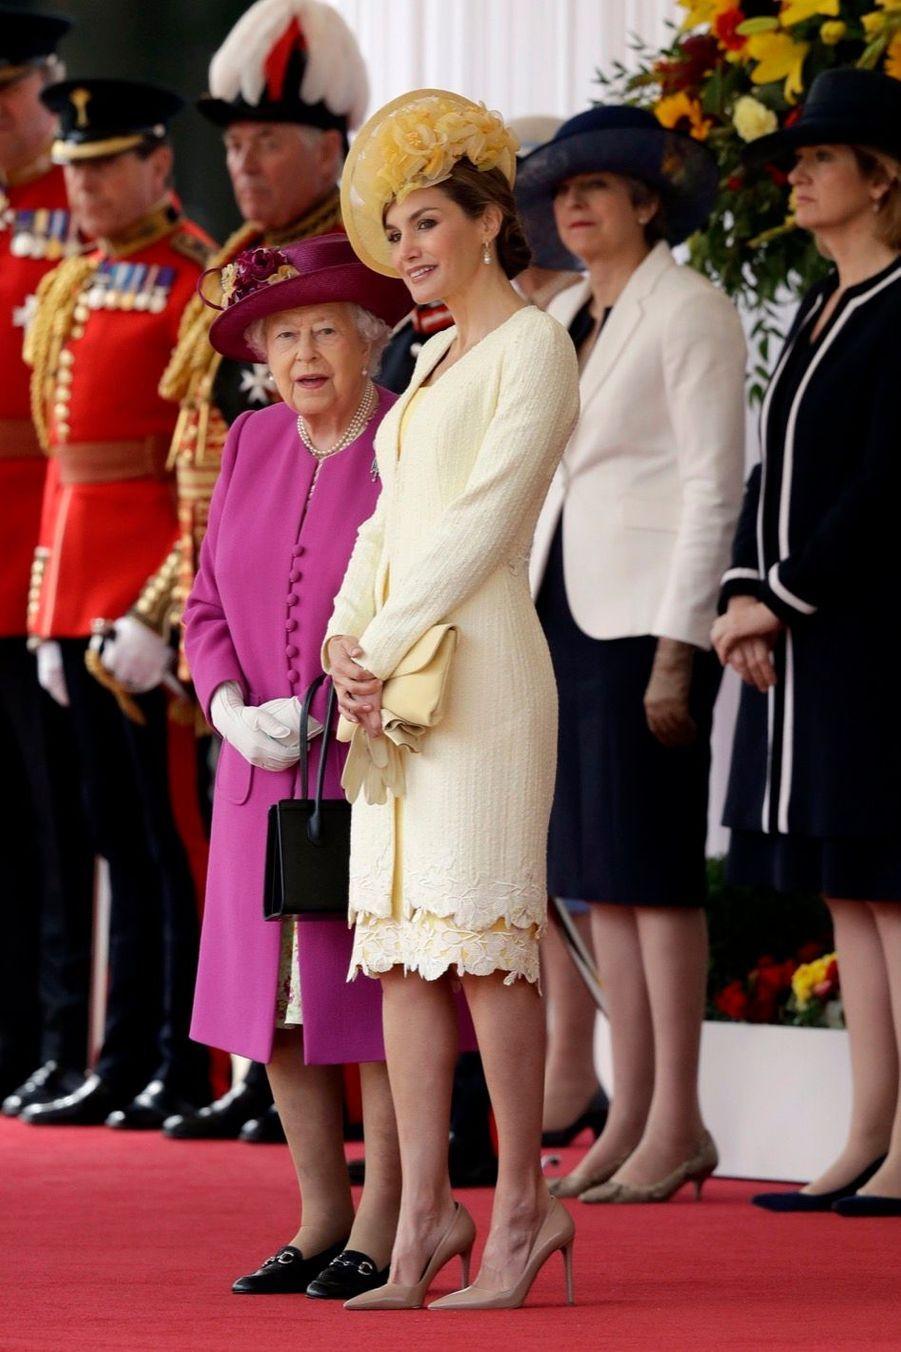 Letizia Et Felipe En Visite Chez La Reine Elizabeth II 12